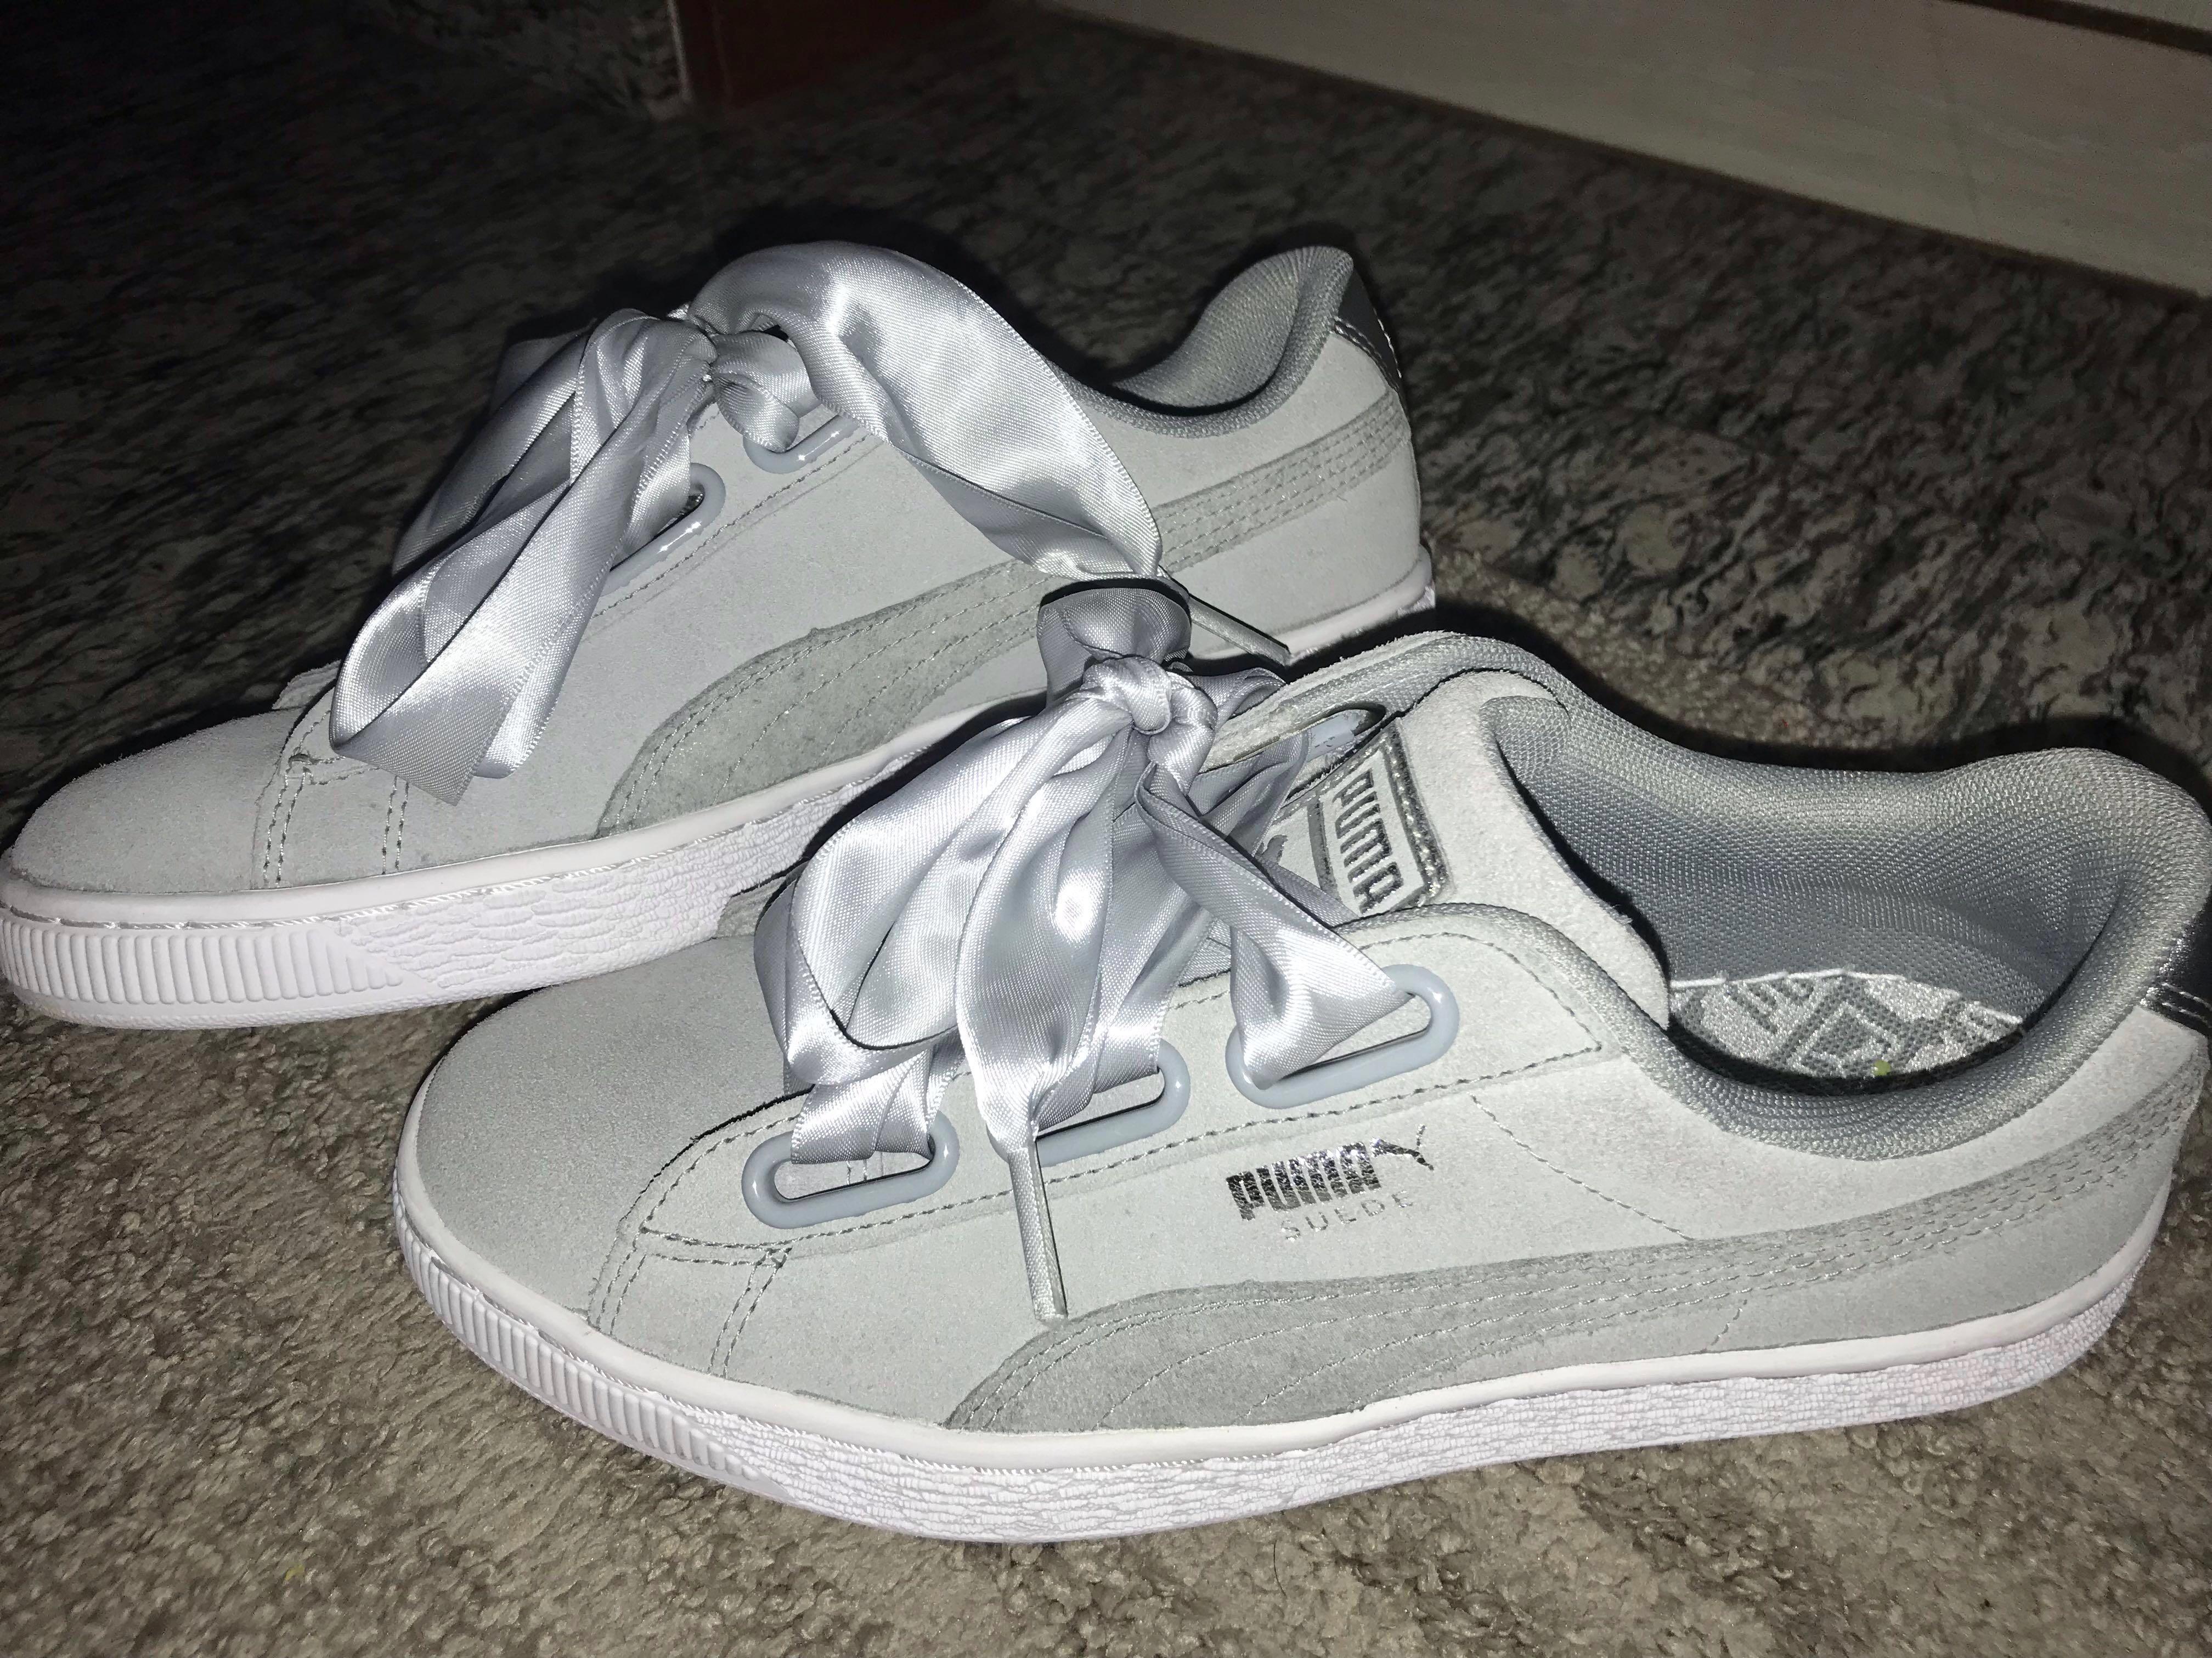 abbeb5851249a Puma Suede Heart Safari in Grey, Women's Fashion, Shoes, Sneakers on ...